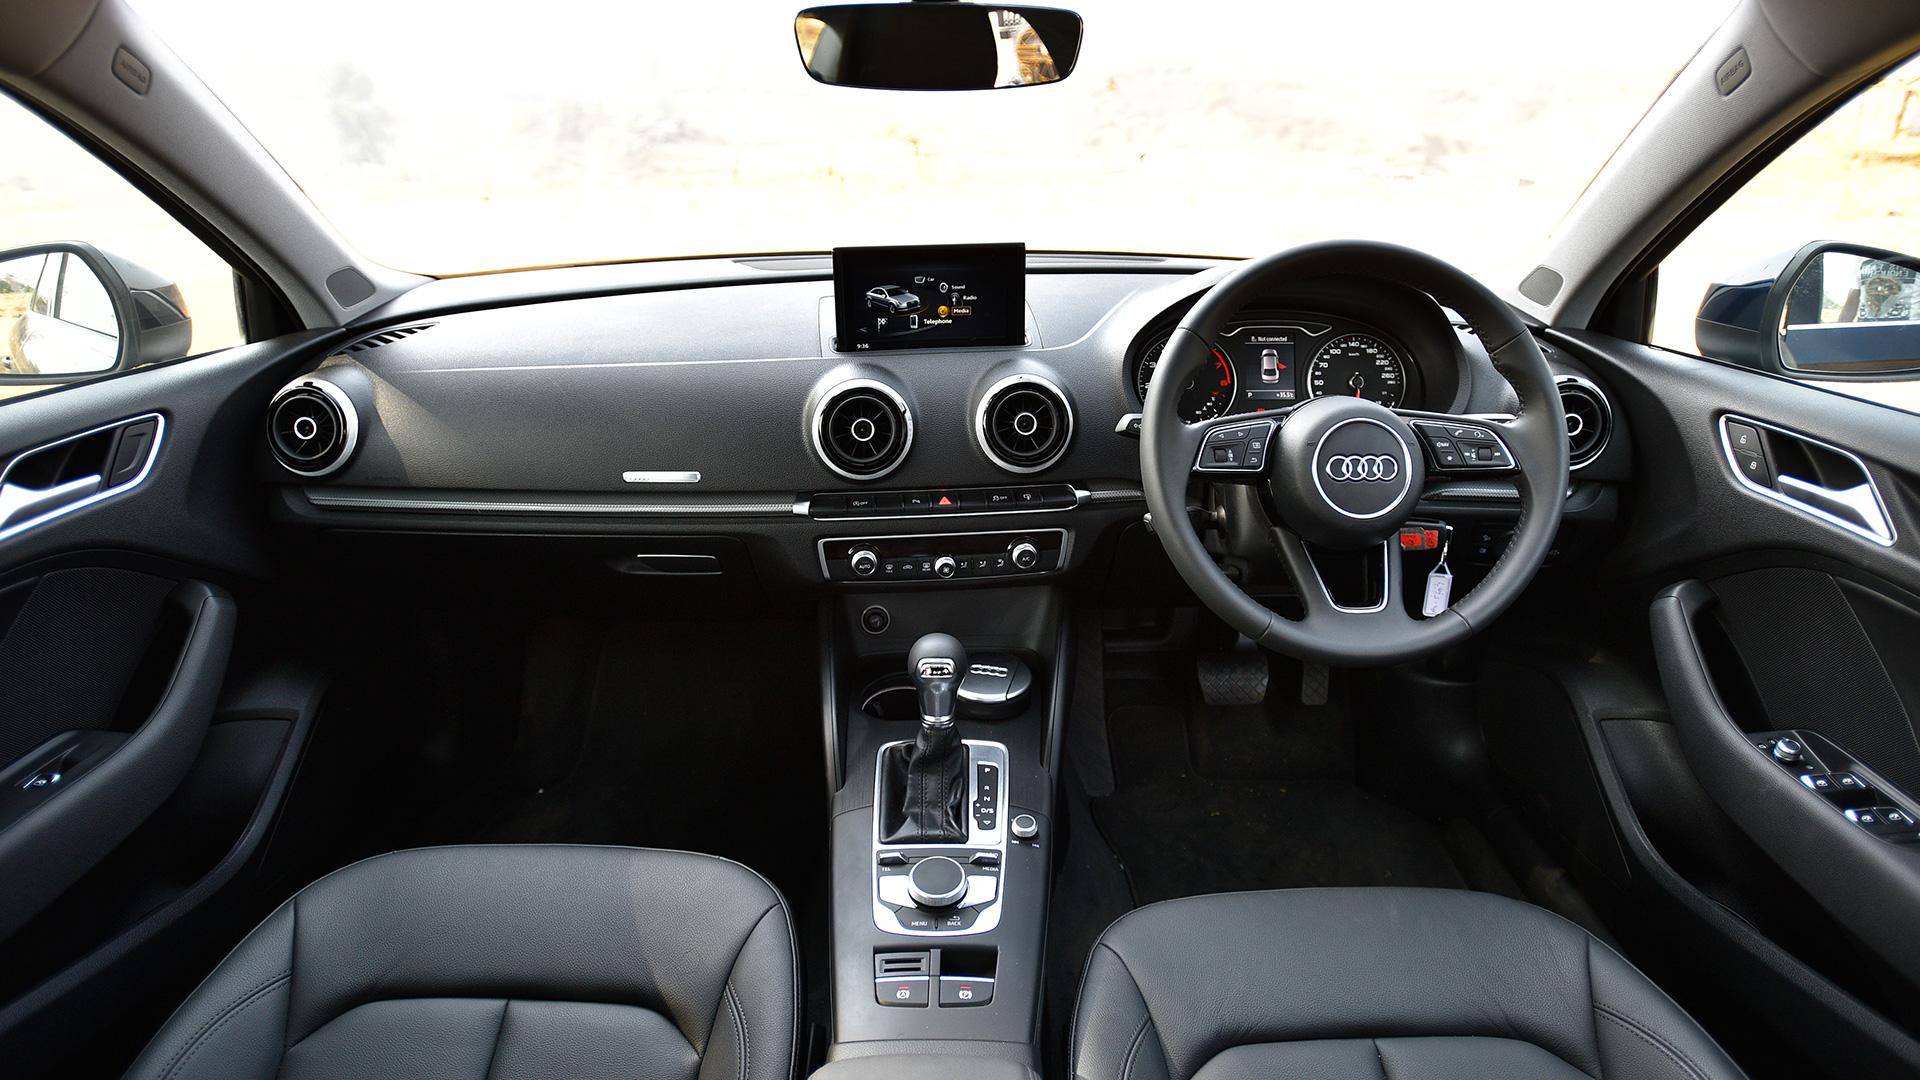 ... Audi A3 2017 35 TFSI Technology Interior ...